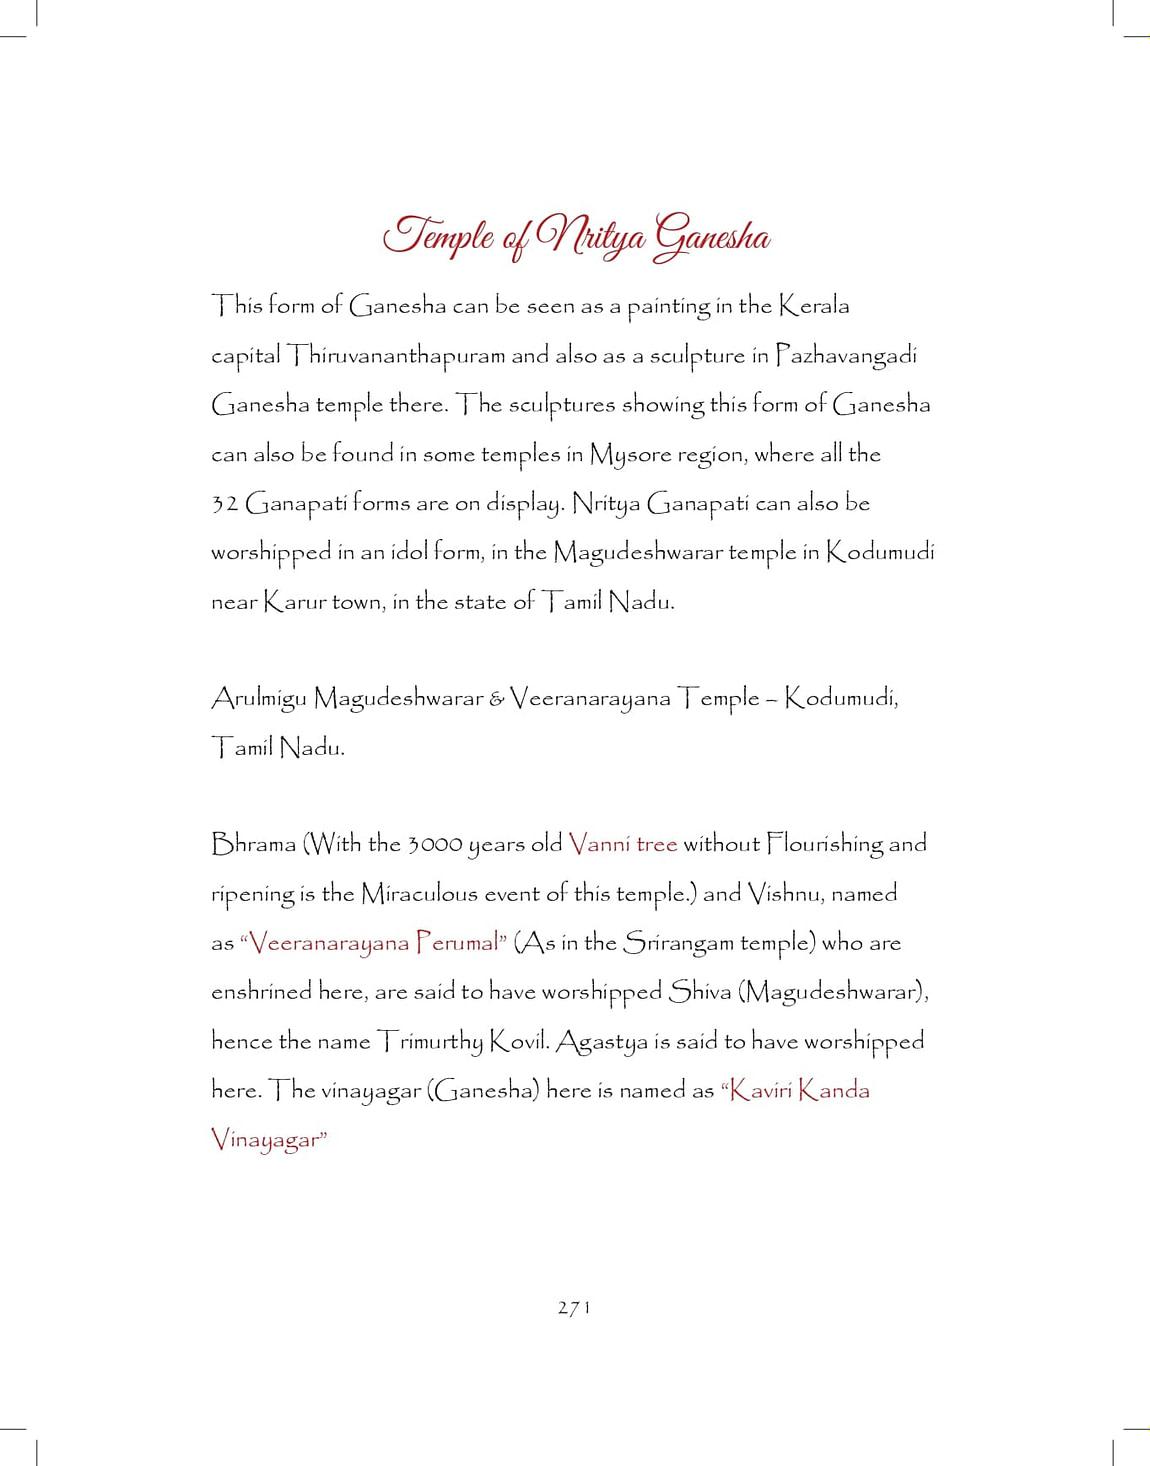 Ganesh-print_pages-to-jpg-0271.jpg